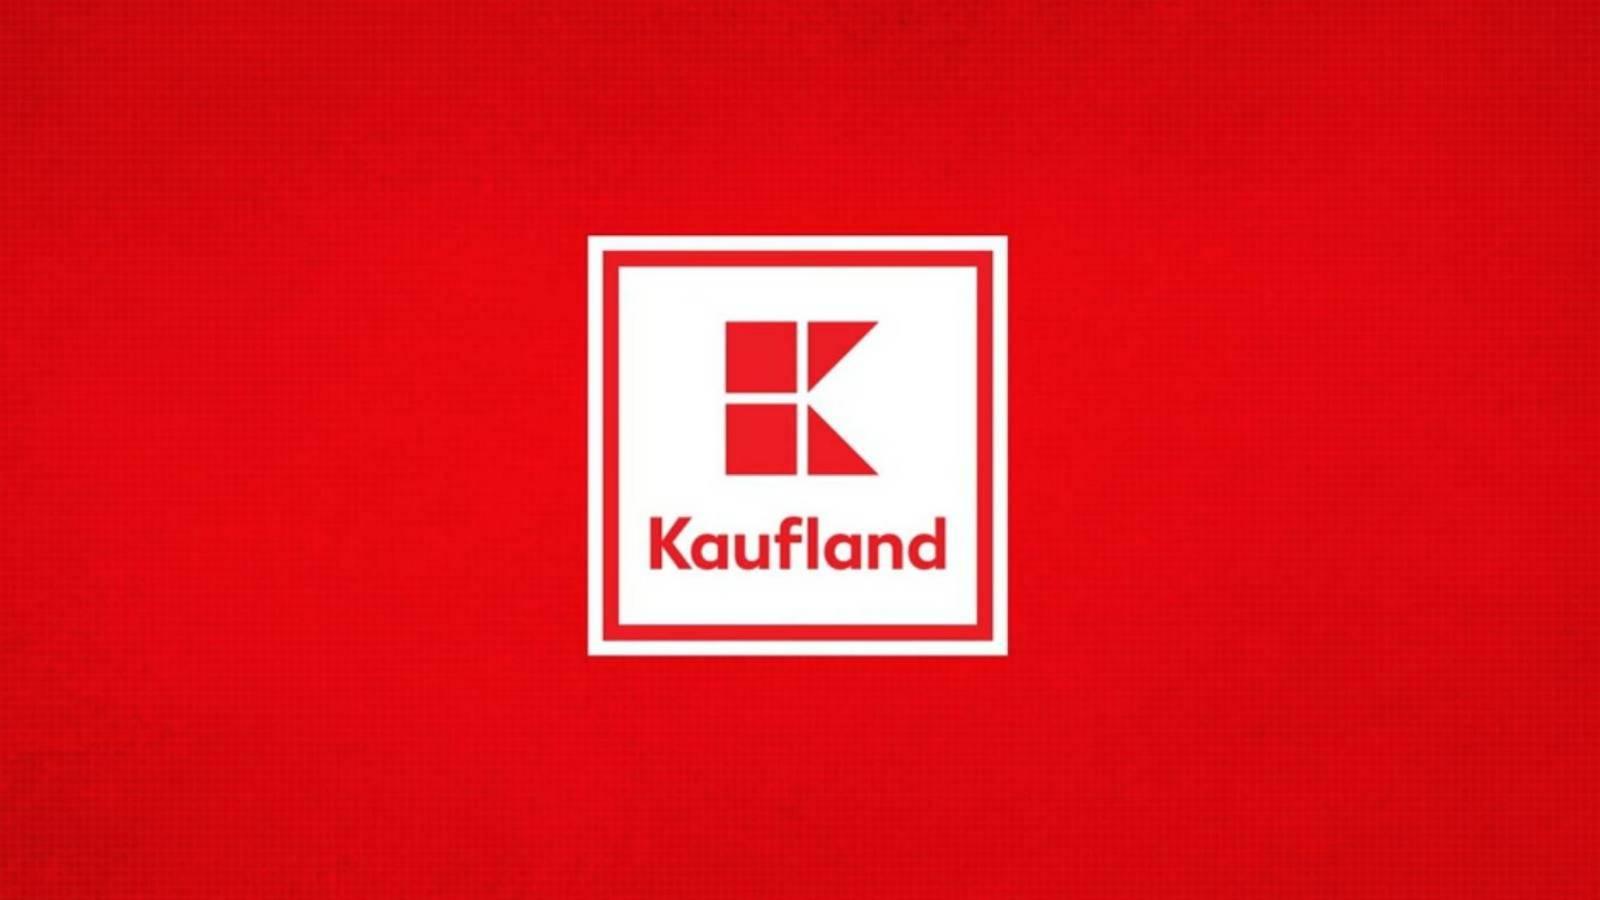 Kaufland personal